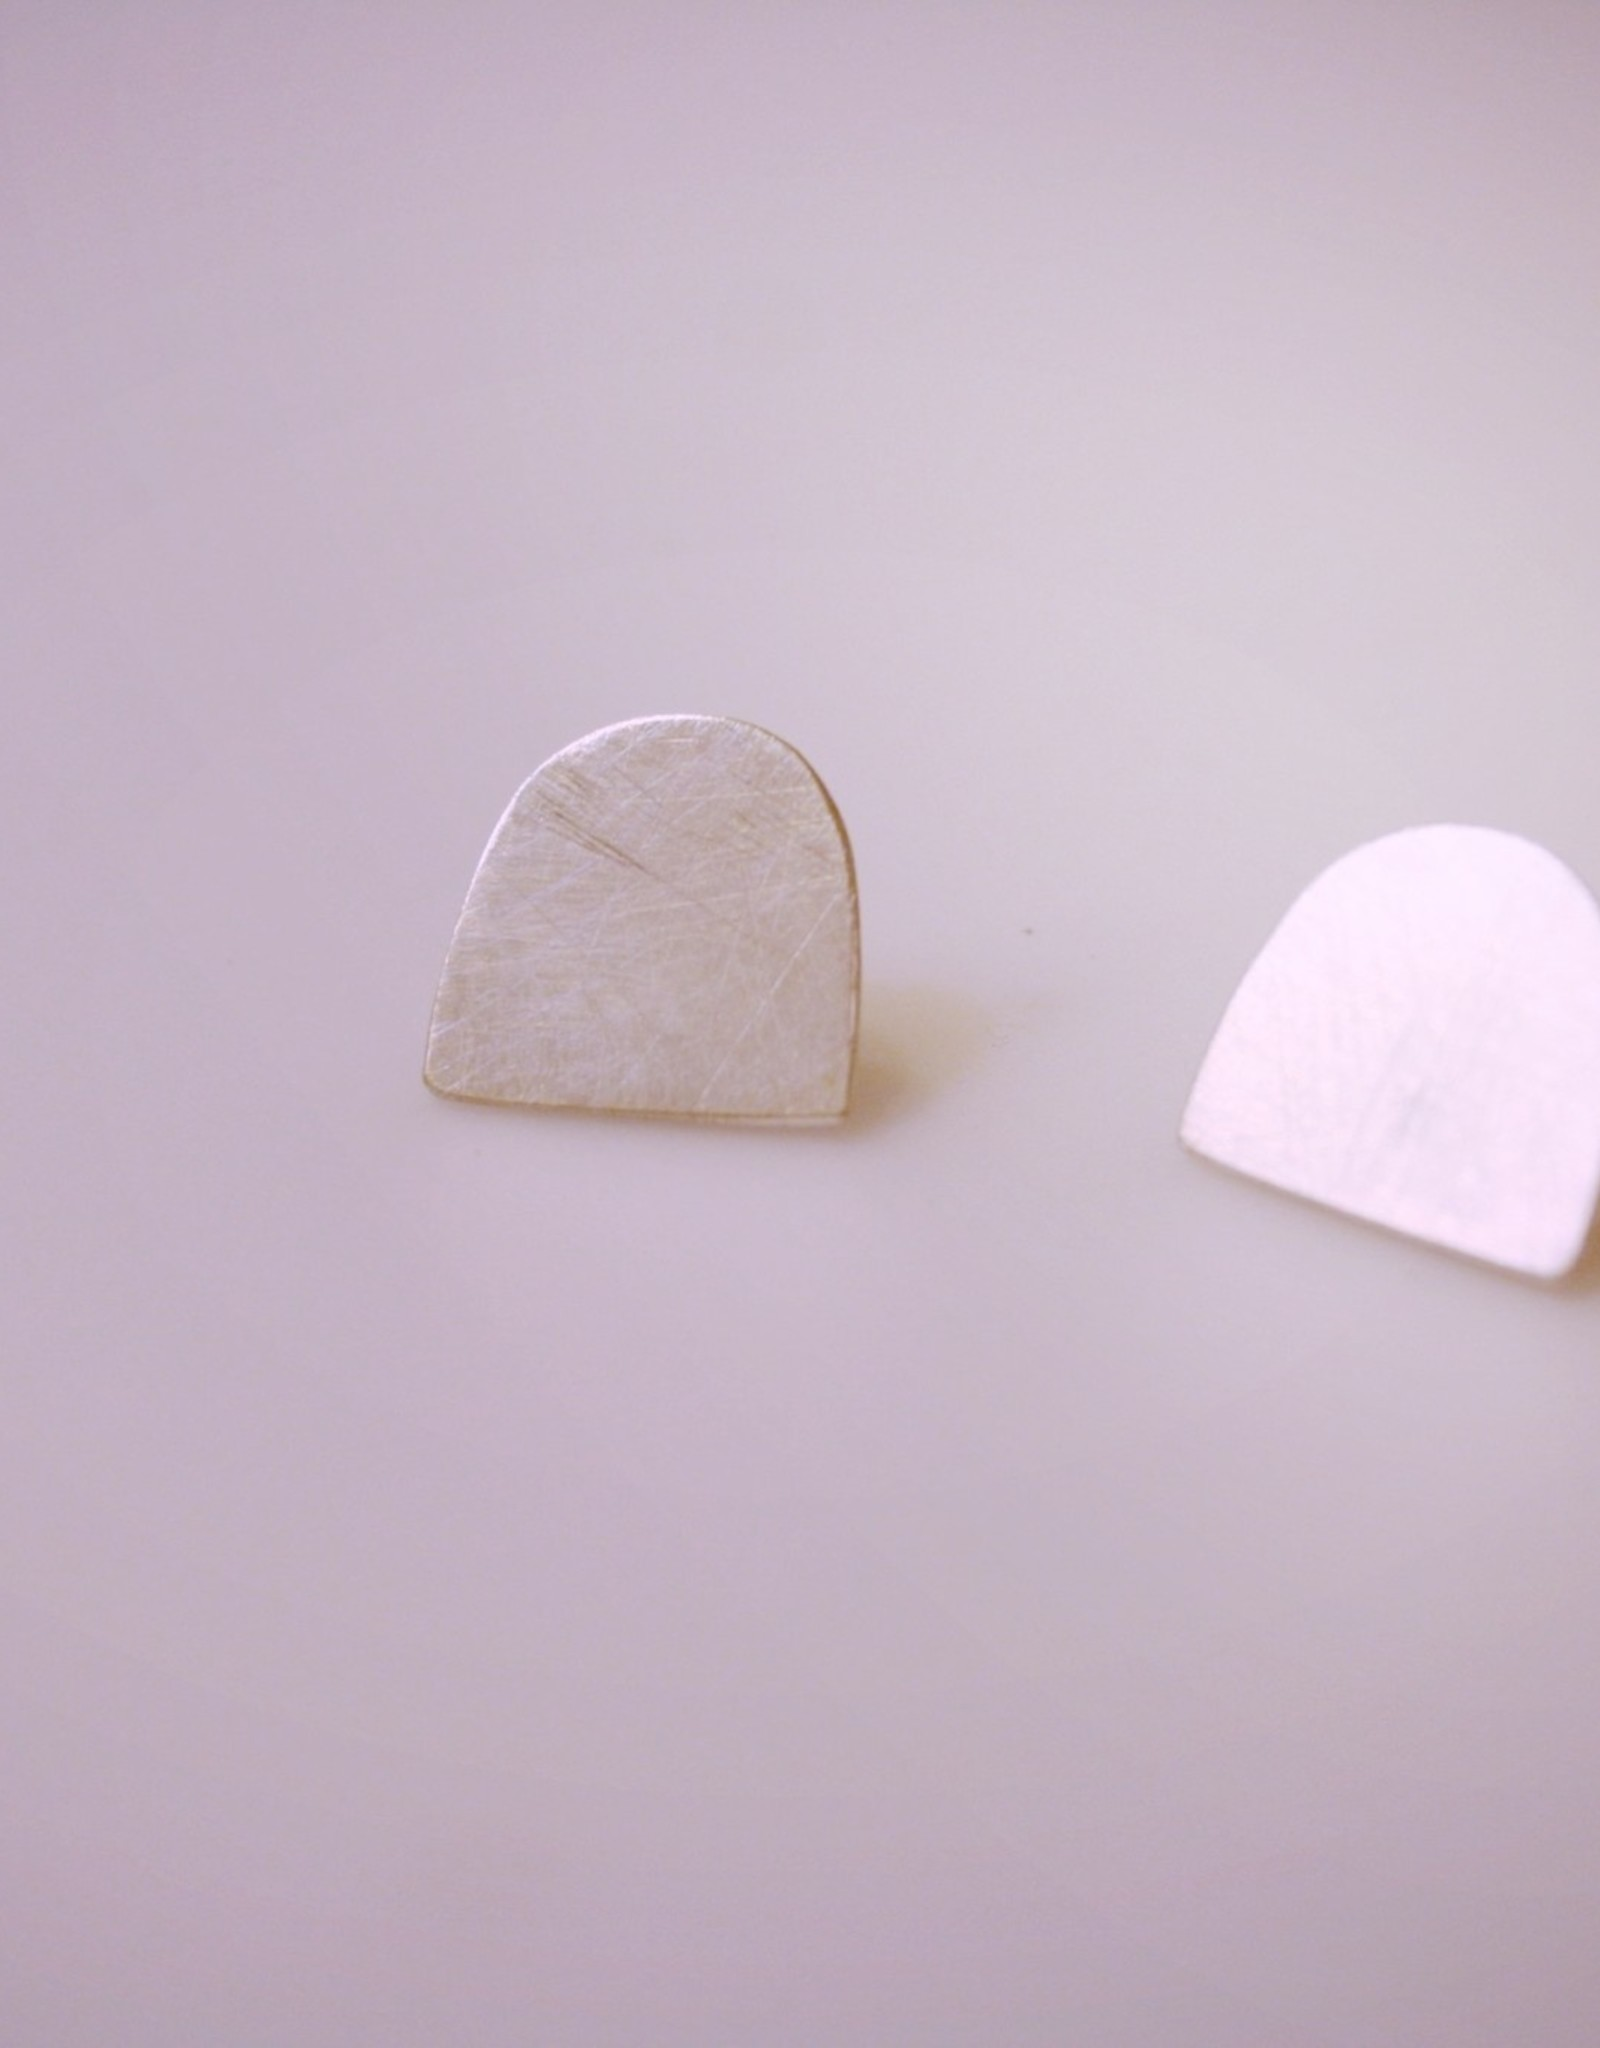 Dome Stud Earrings in Silver or Brass